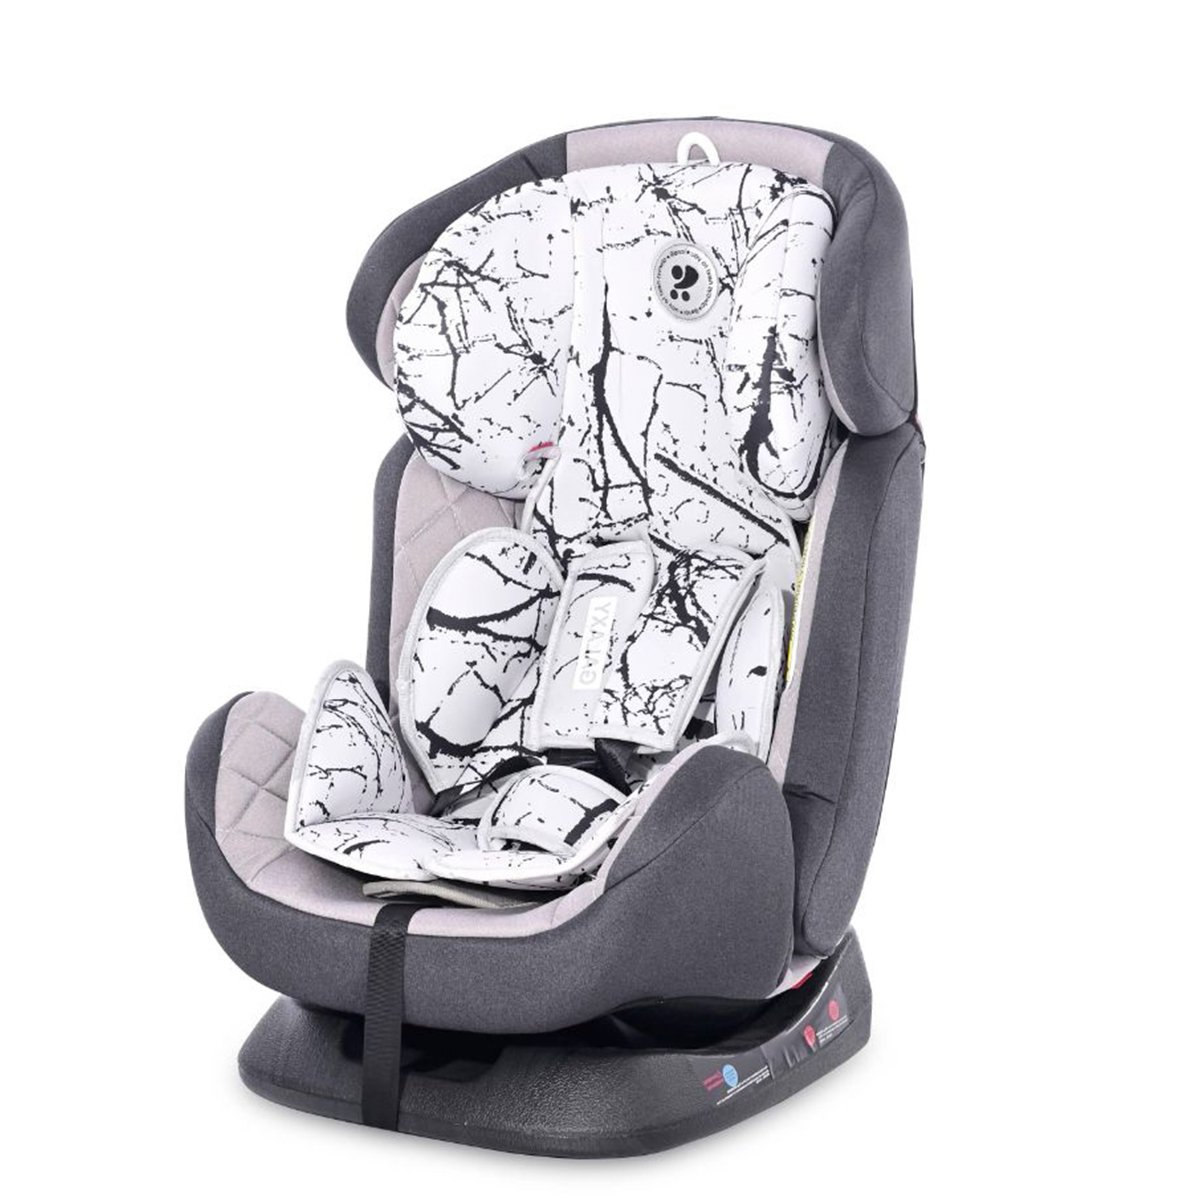 Scaun auto copii Lorelli Galaxy 0-36 KG Grey